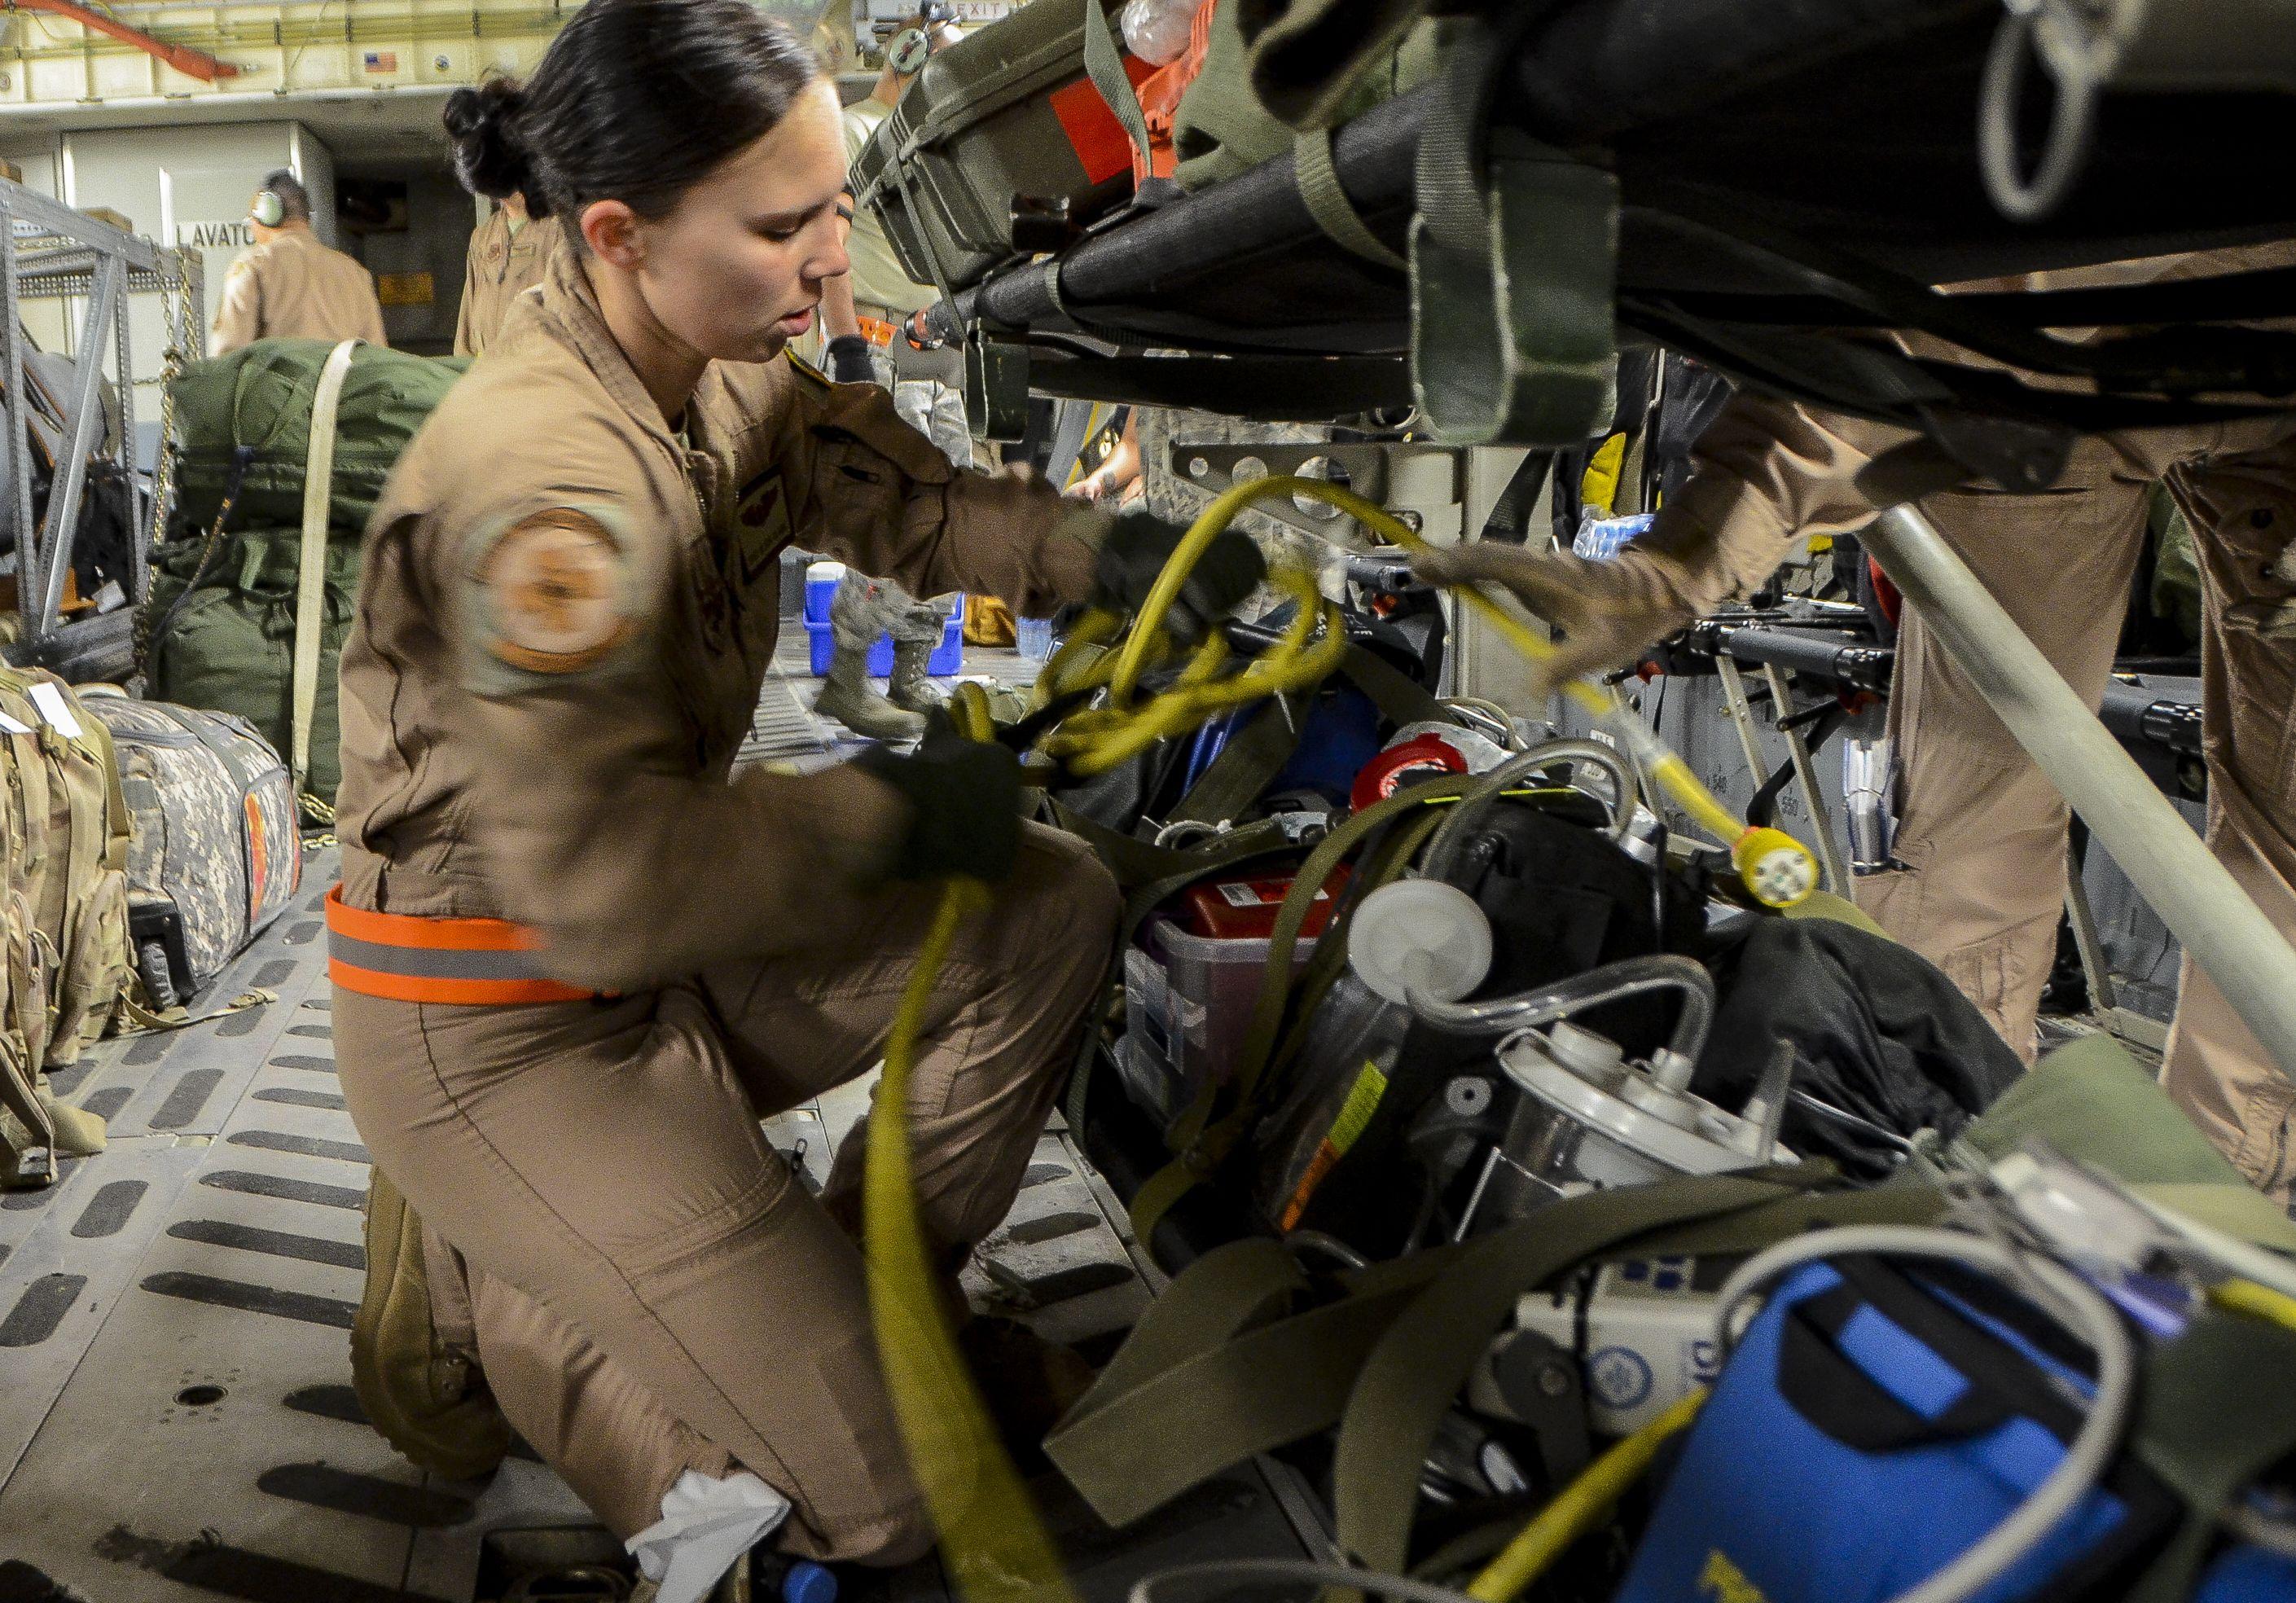 Staff Sgt. Alicia Clark readies medical equipment before